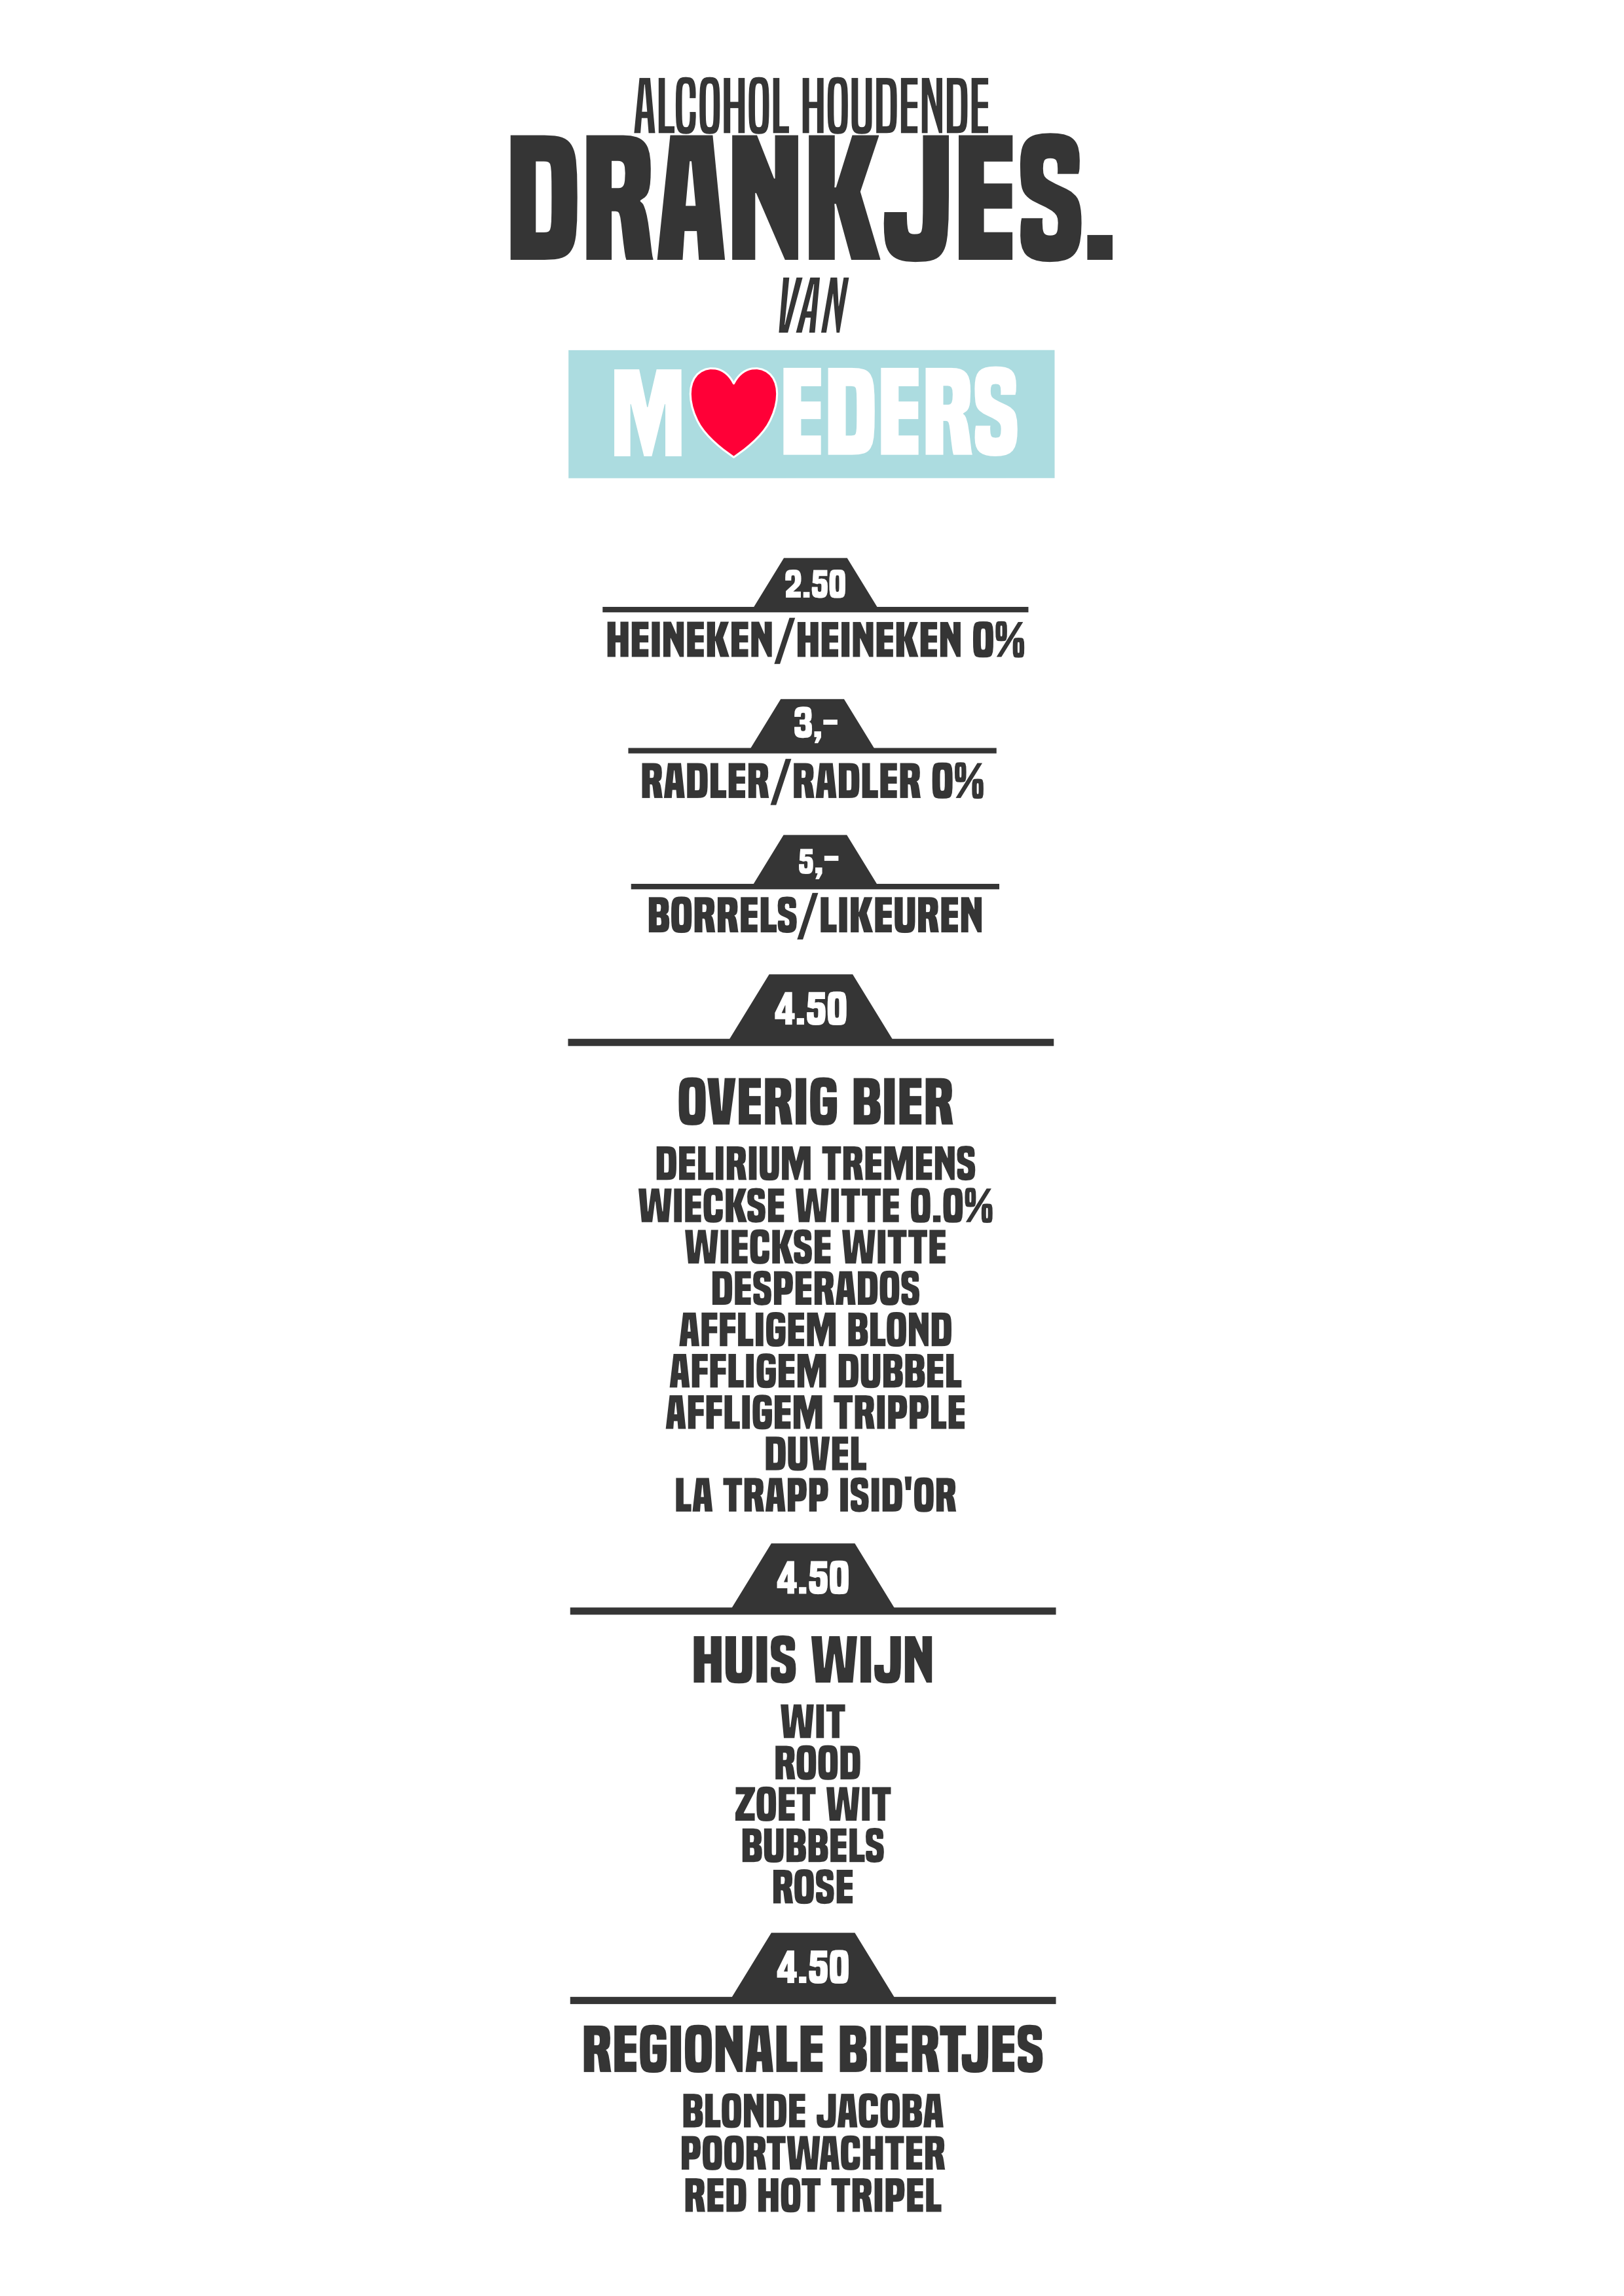 moeders alc.drankjes kaart 14 april 2019.png